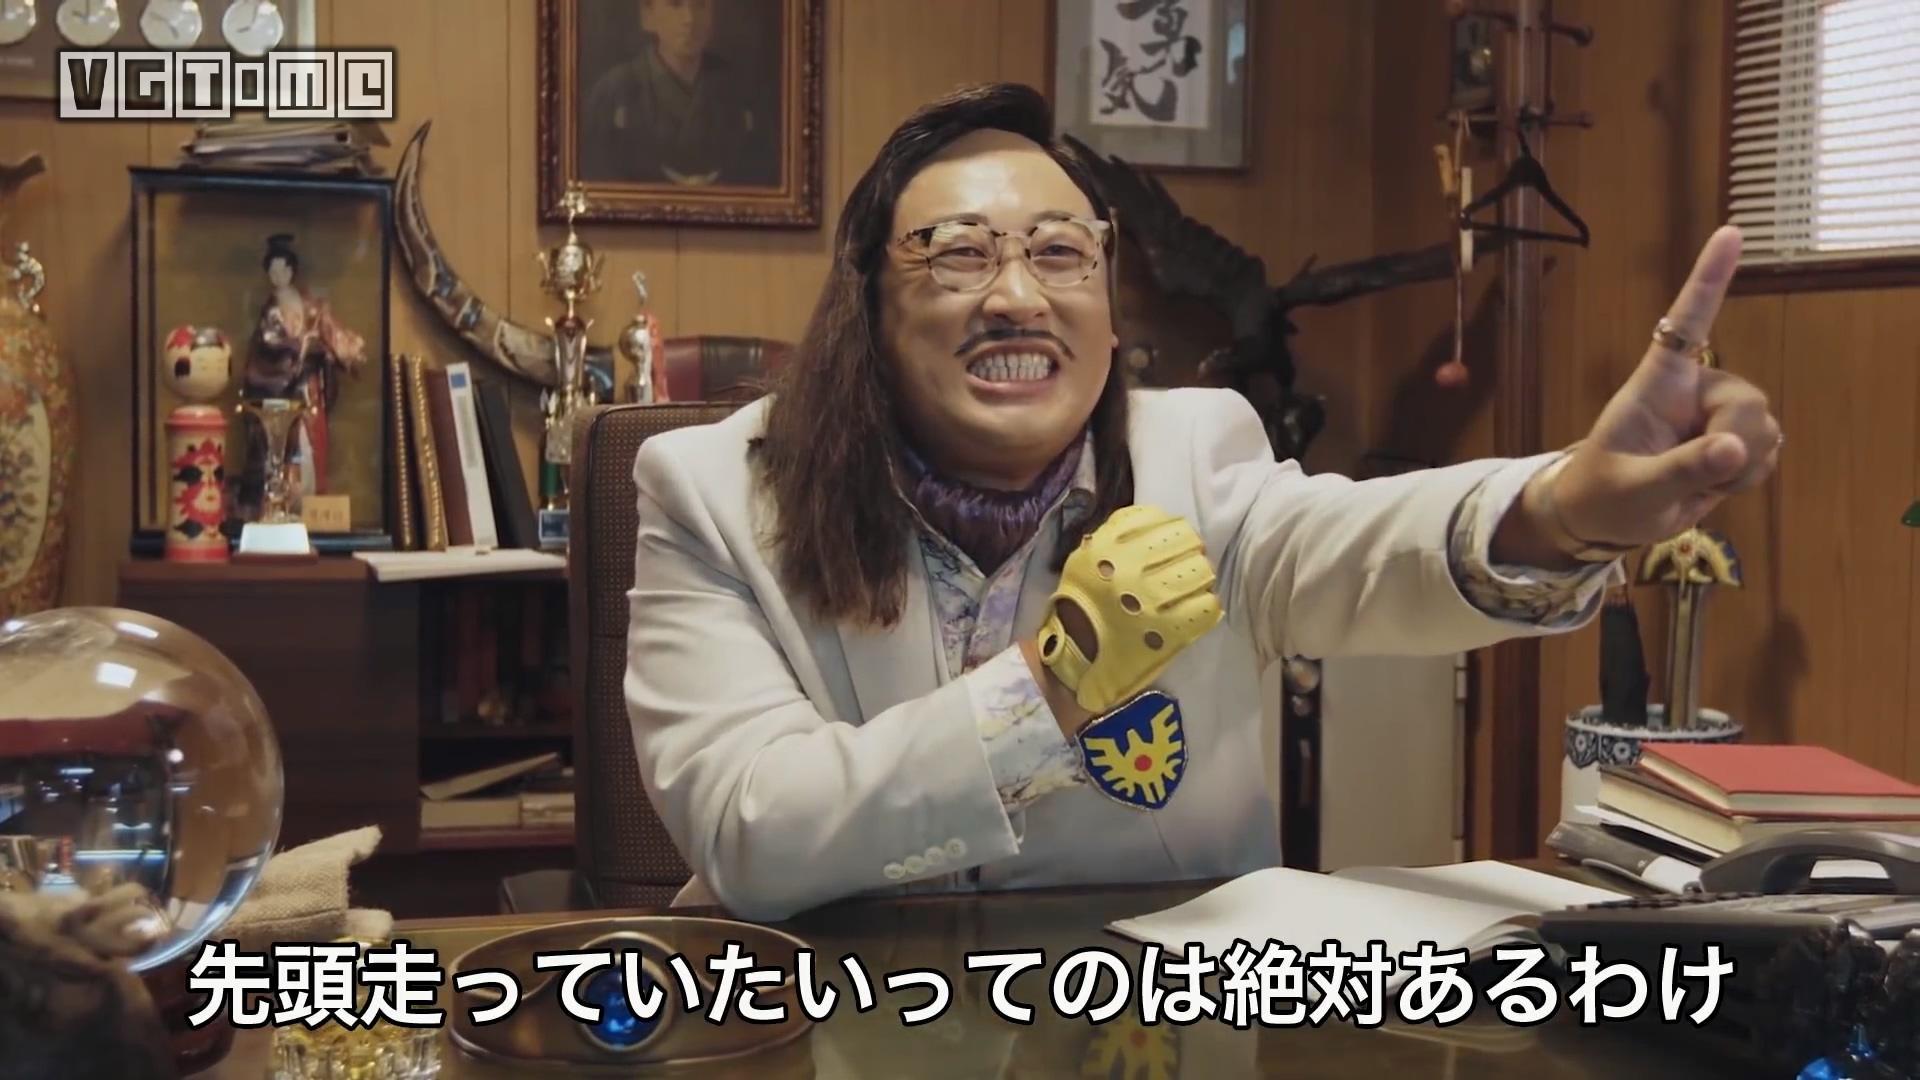 Switch《勇者斗恶龙11S》广告:现世勇者安利记